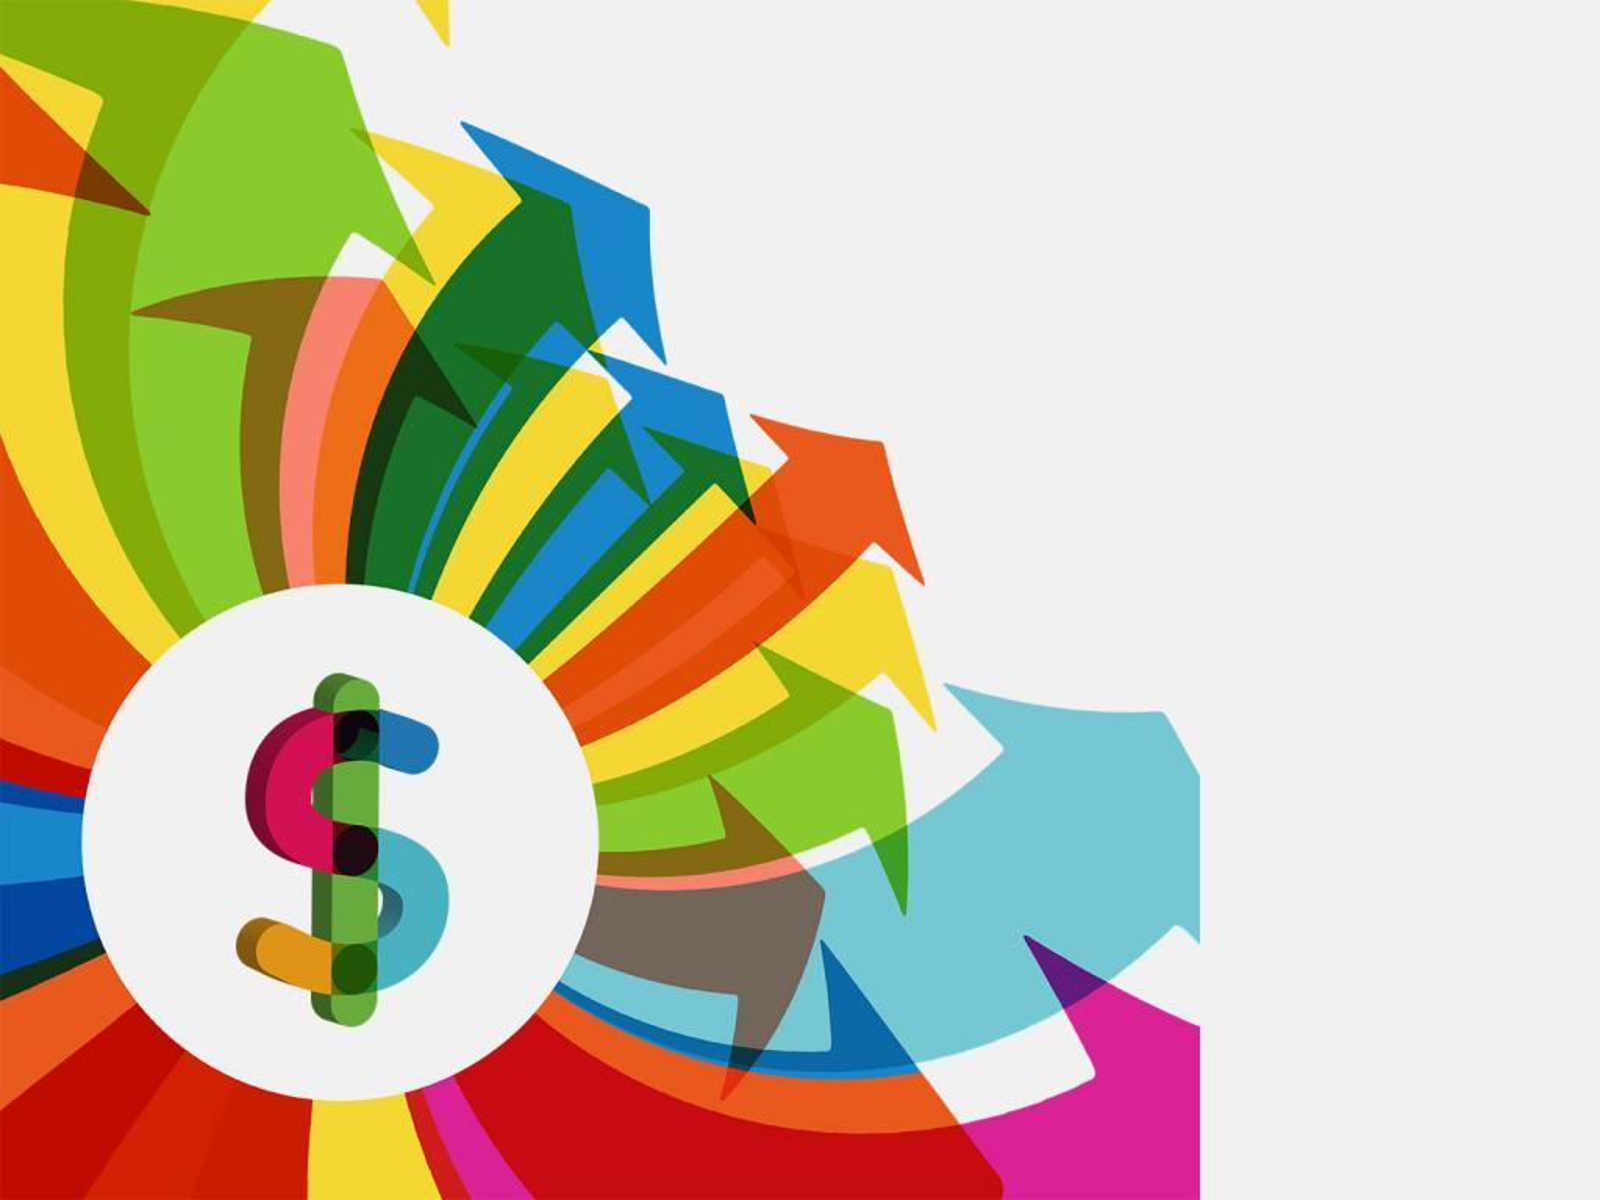 Dollar Economy PPT Backgrounds